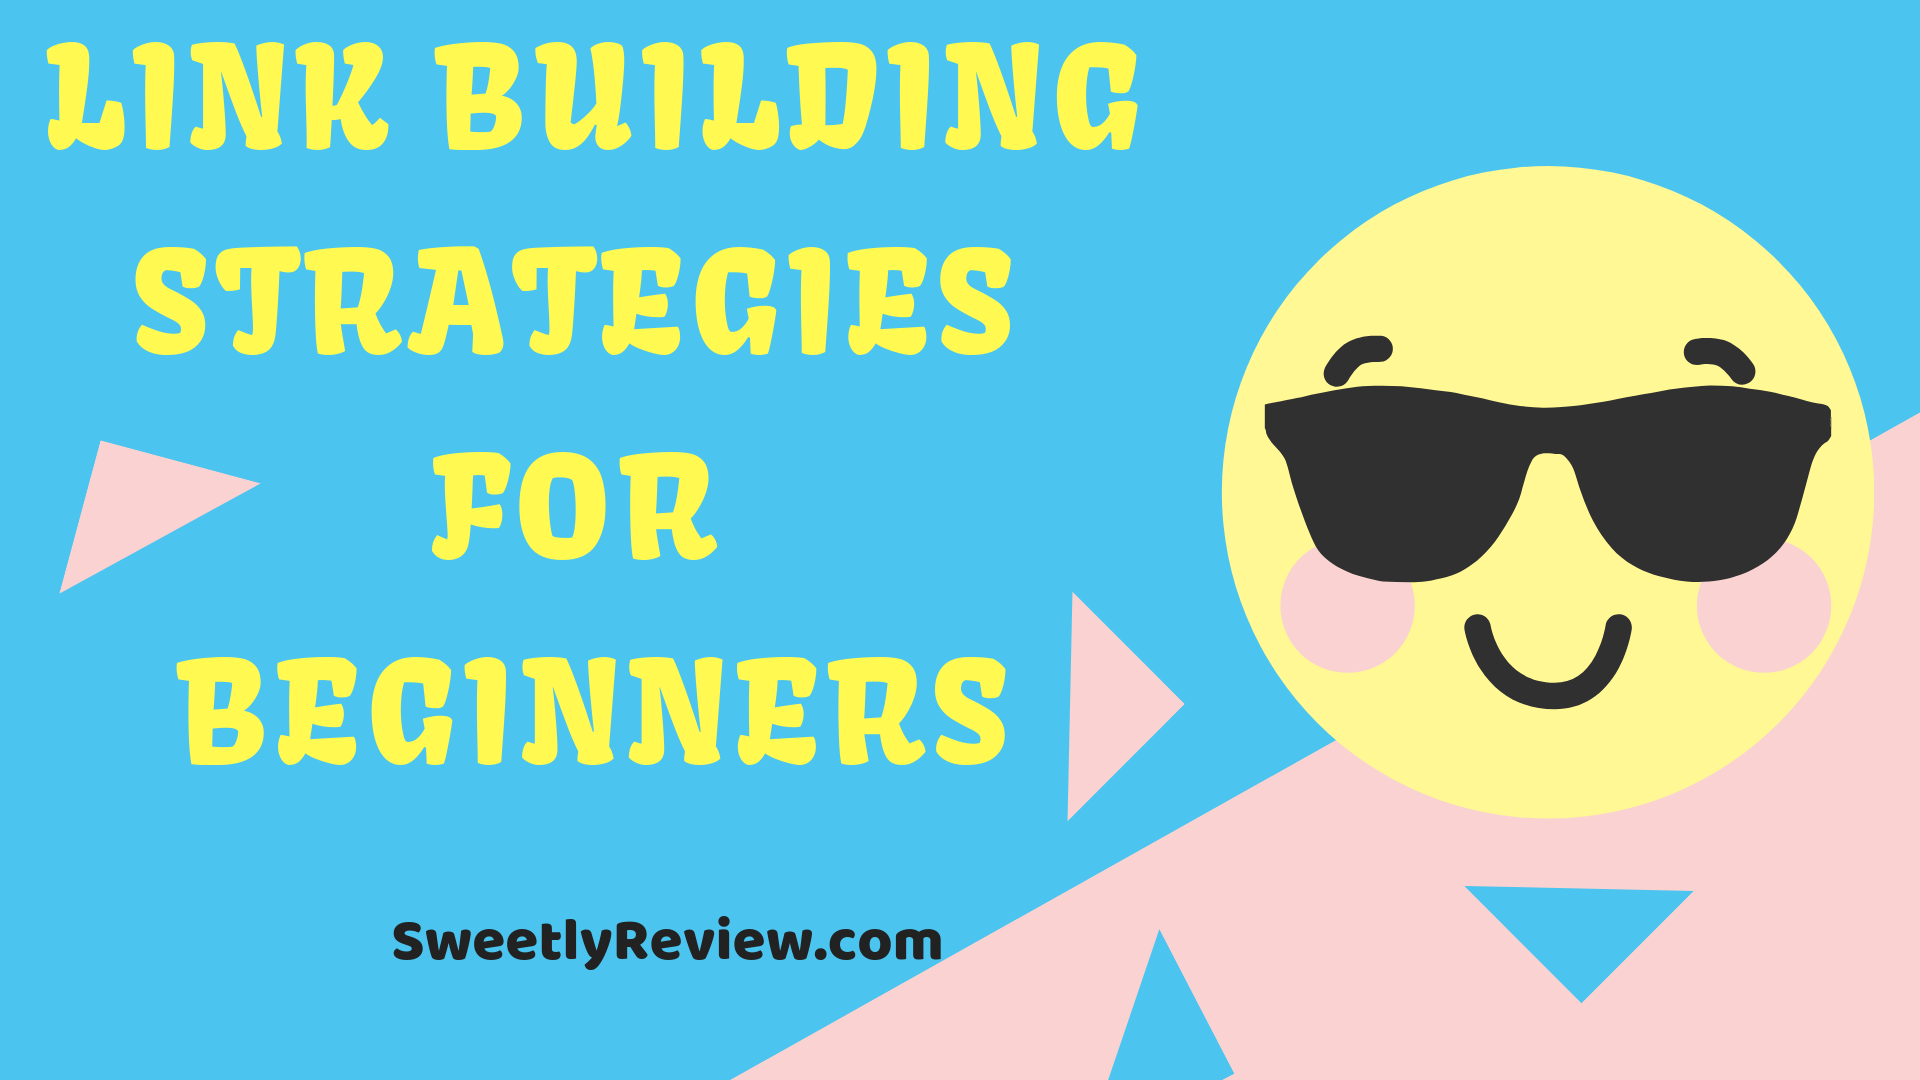 Link Building Strategies for Beginners